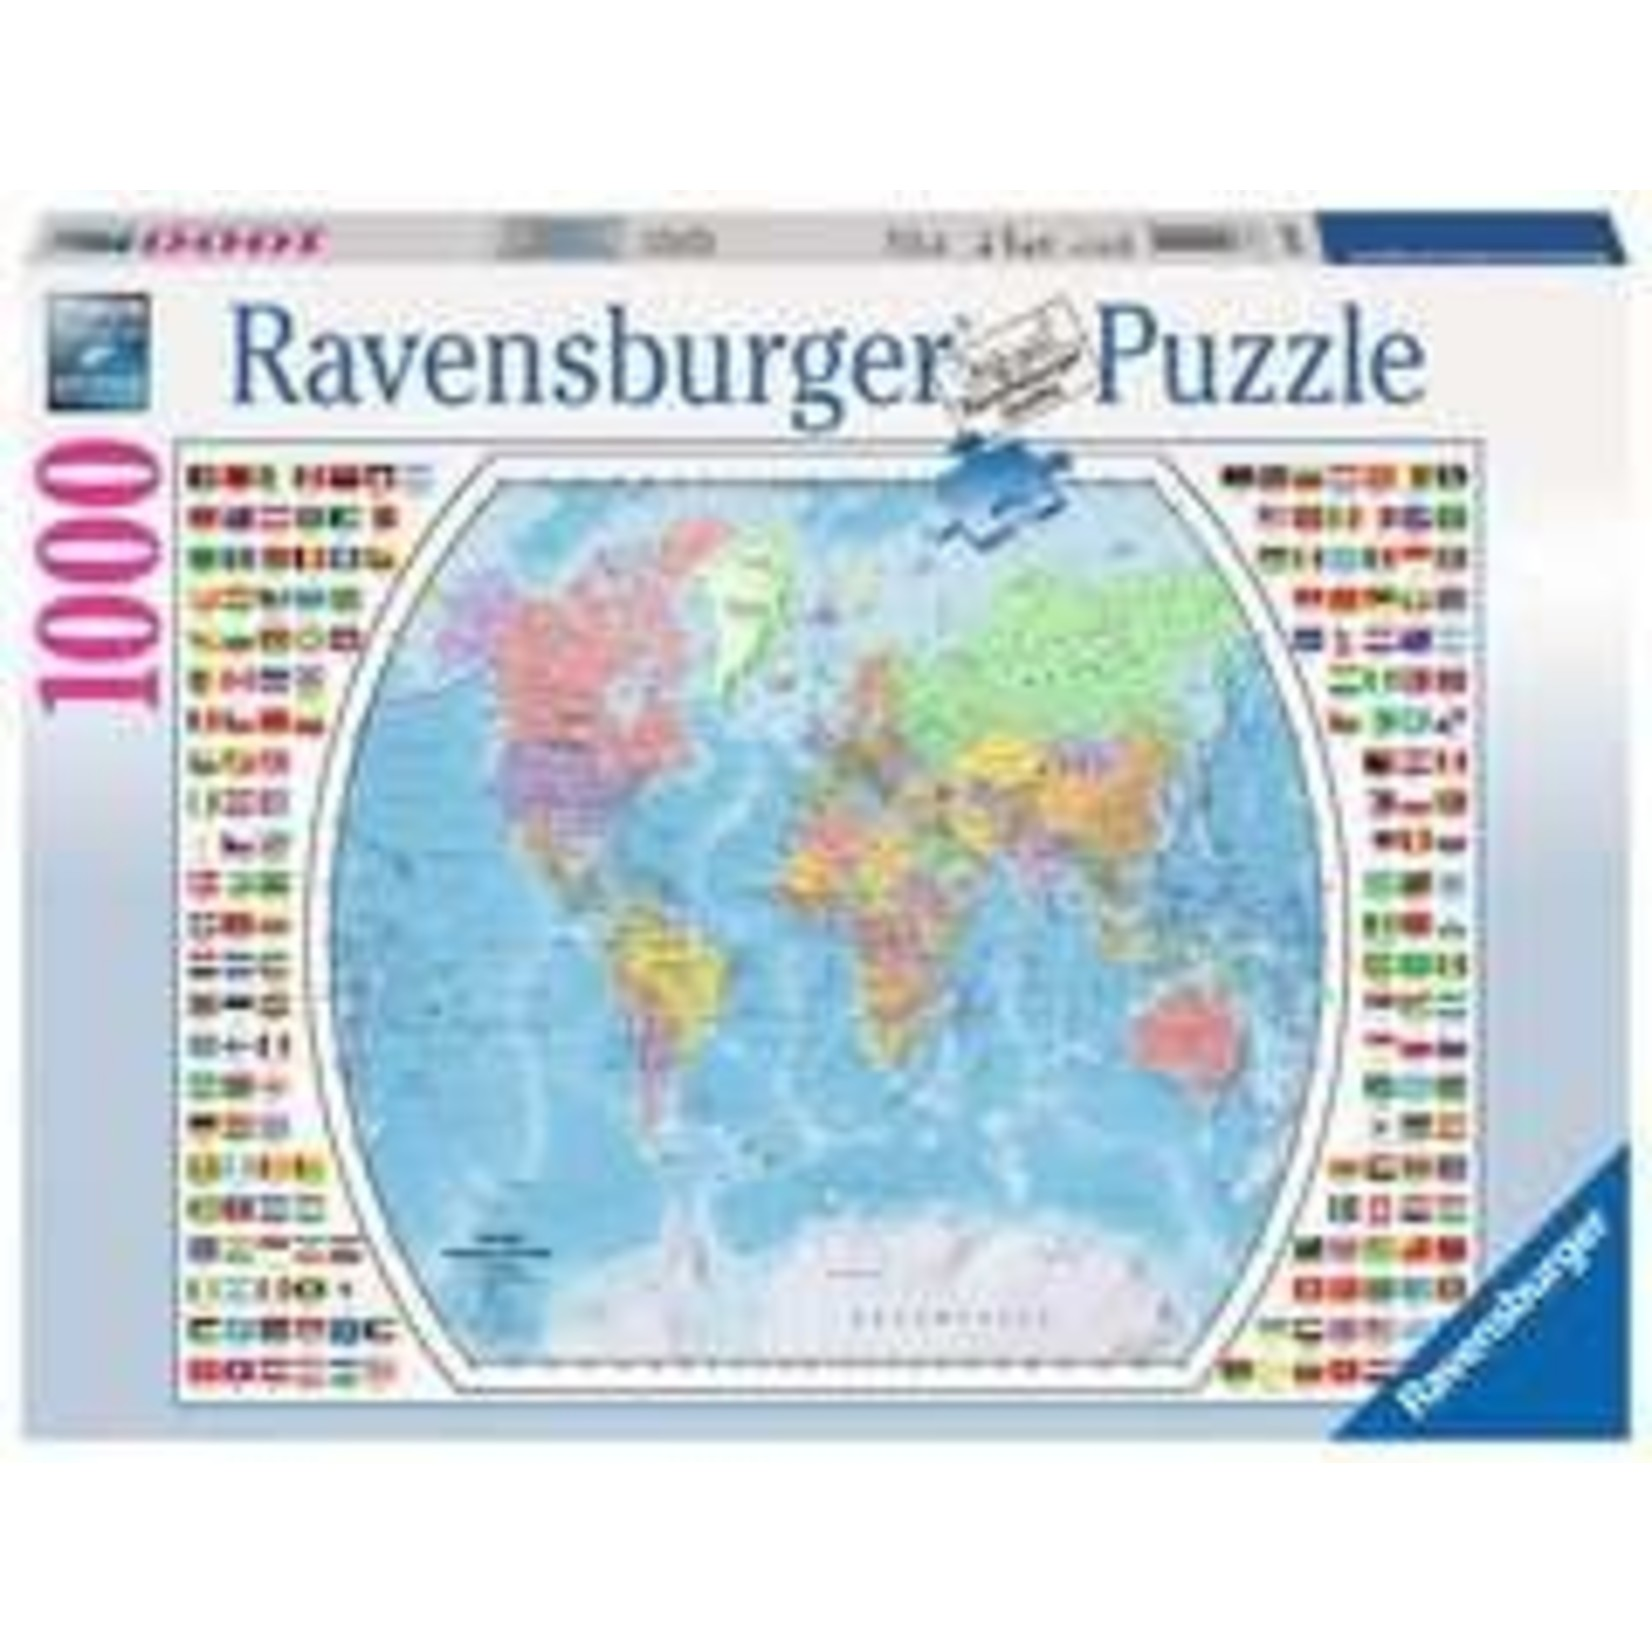 Ravensburger Political World Map - 1000 Piece Jigsaw Puzzle